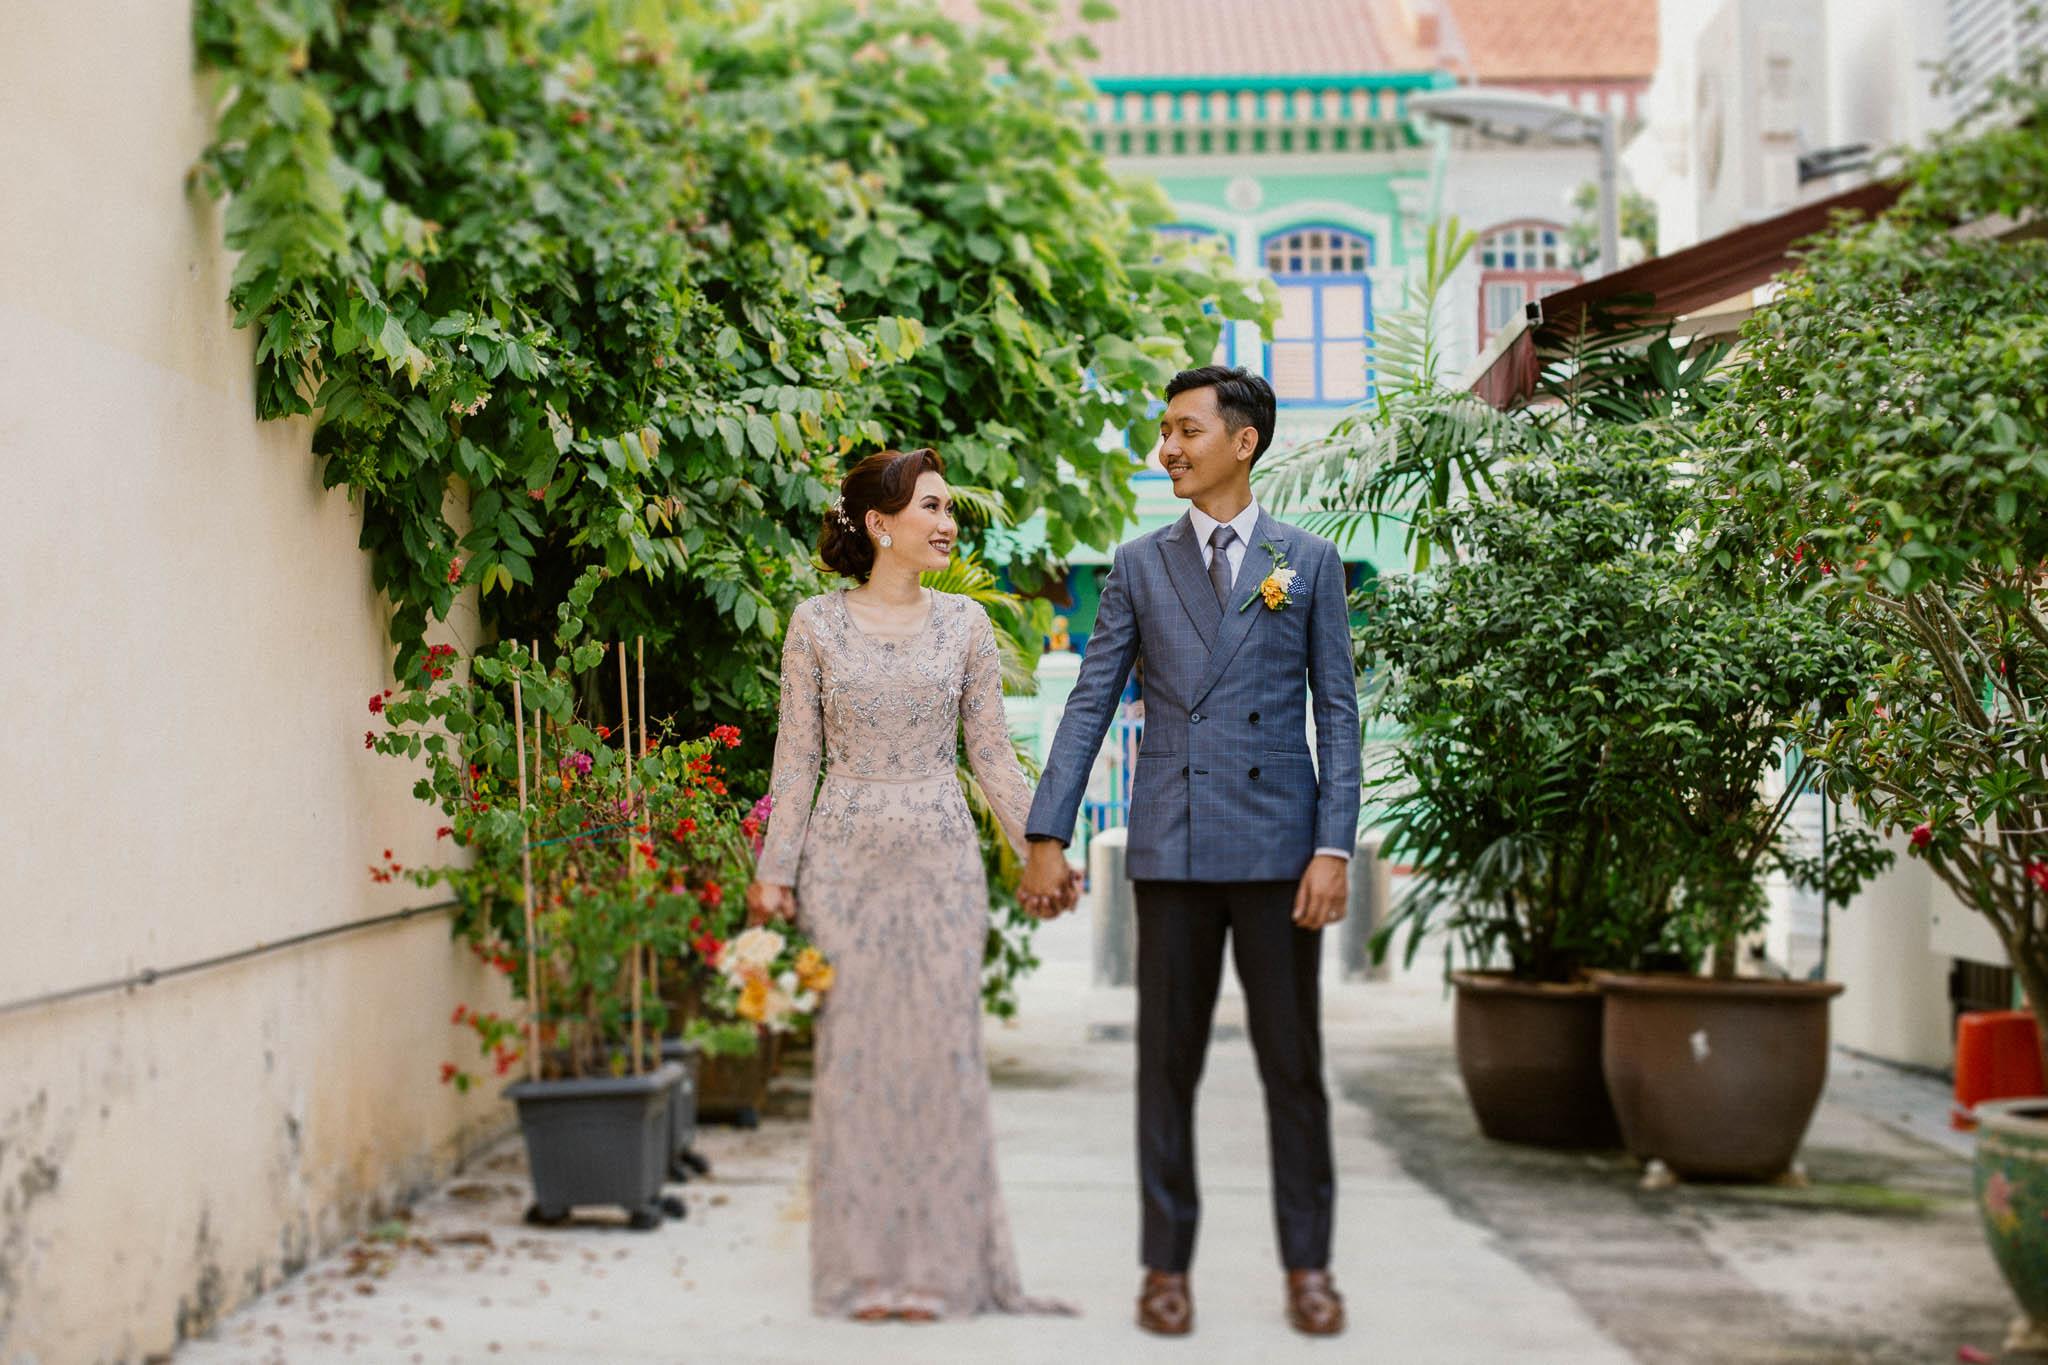 singapore-wedding-photographer-addafiq-nufail-079.jpg